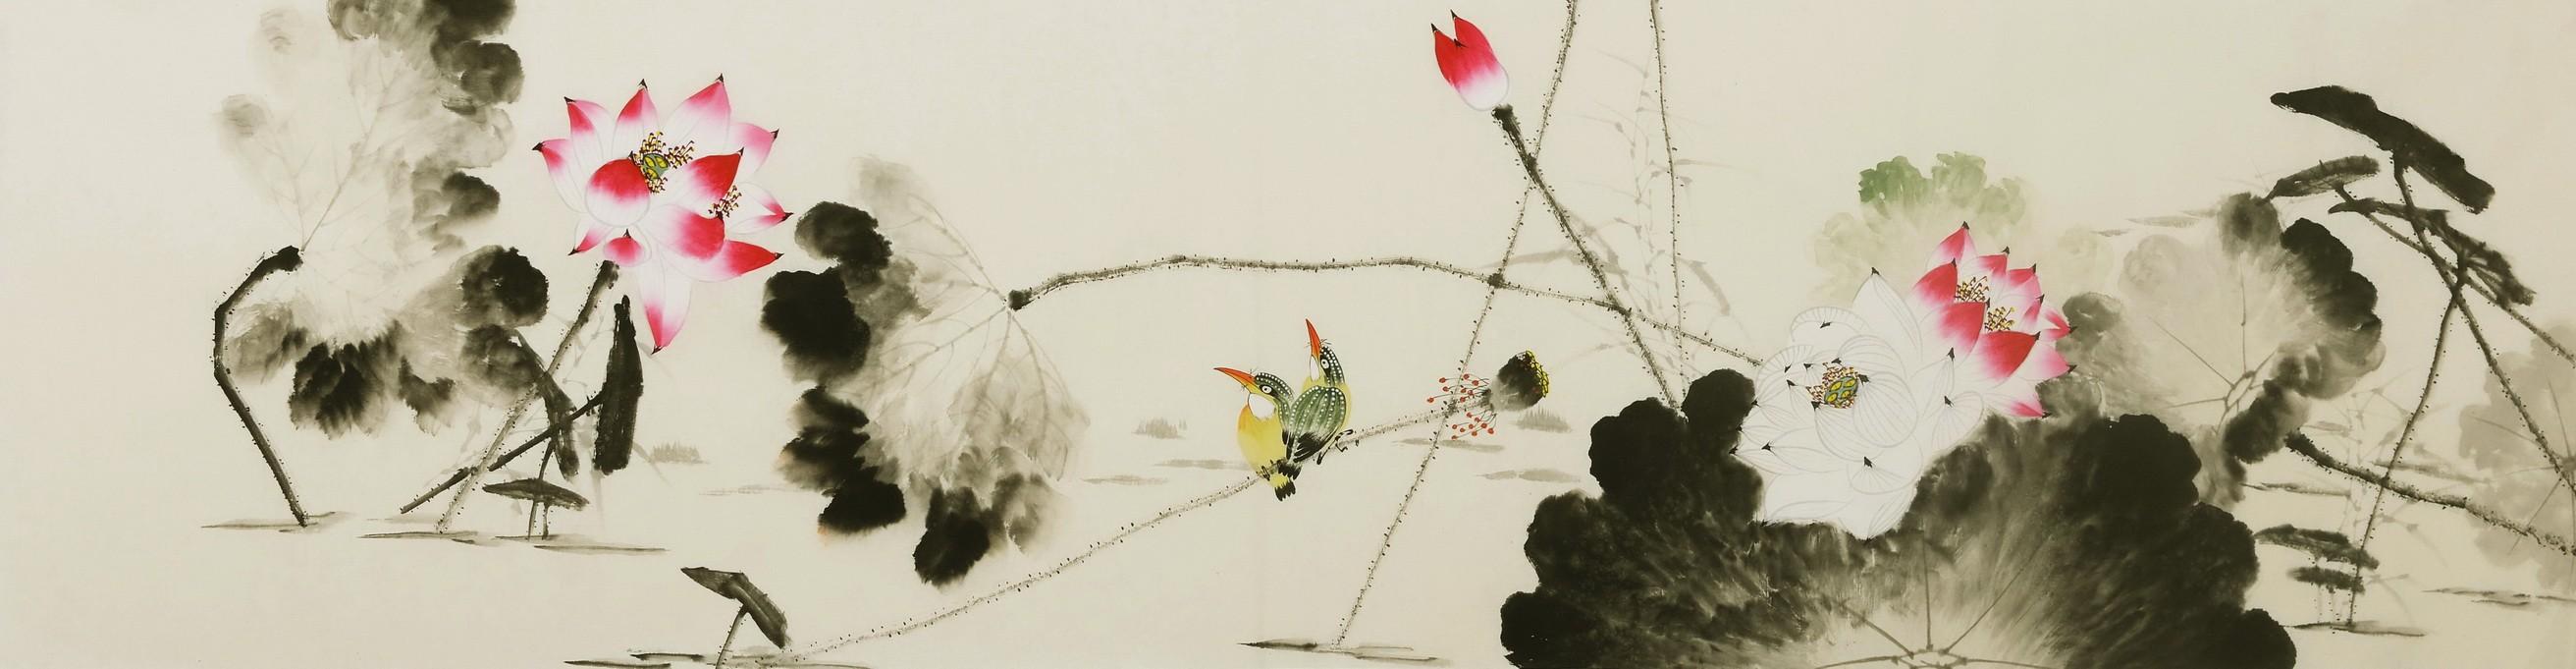 Kingfisher - CNAG004125